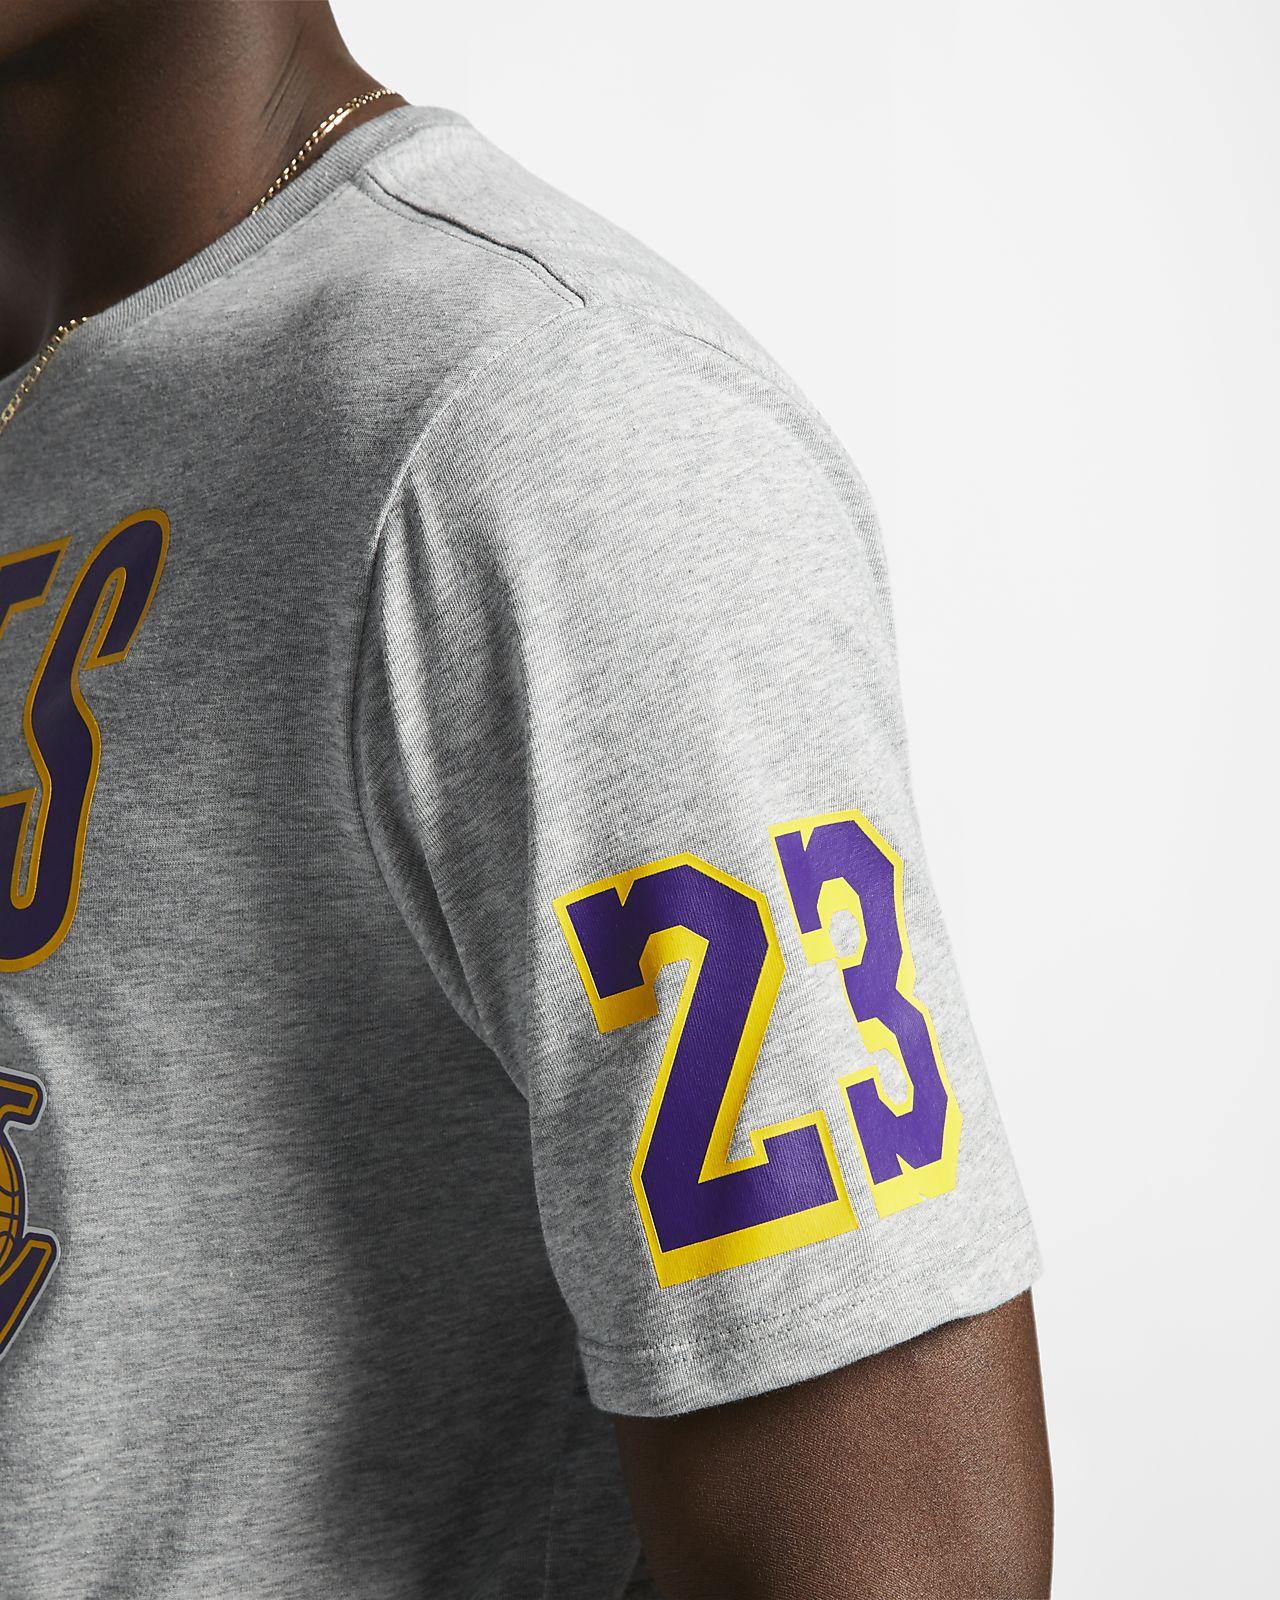 7a68c09175 Tee-shirt NBA Los Angeles Lakers Nike Dri-FIT pour Homme. Nike.com CA